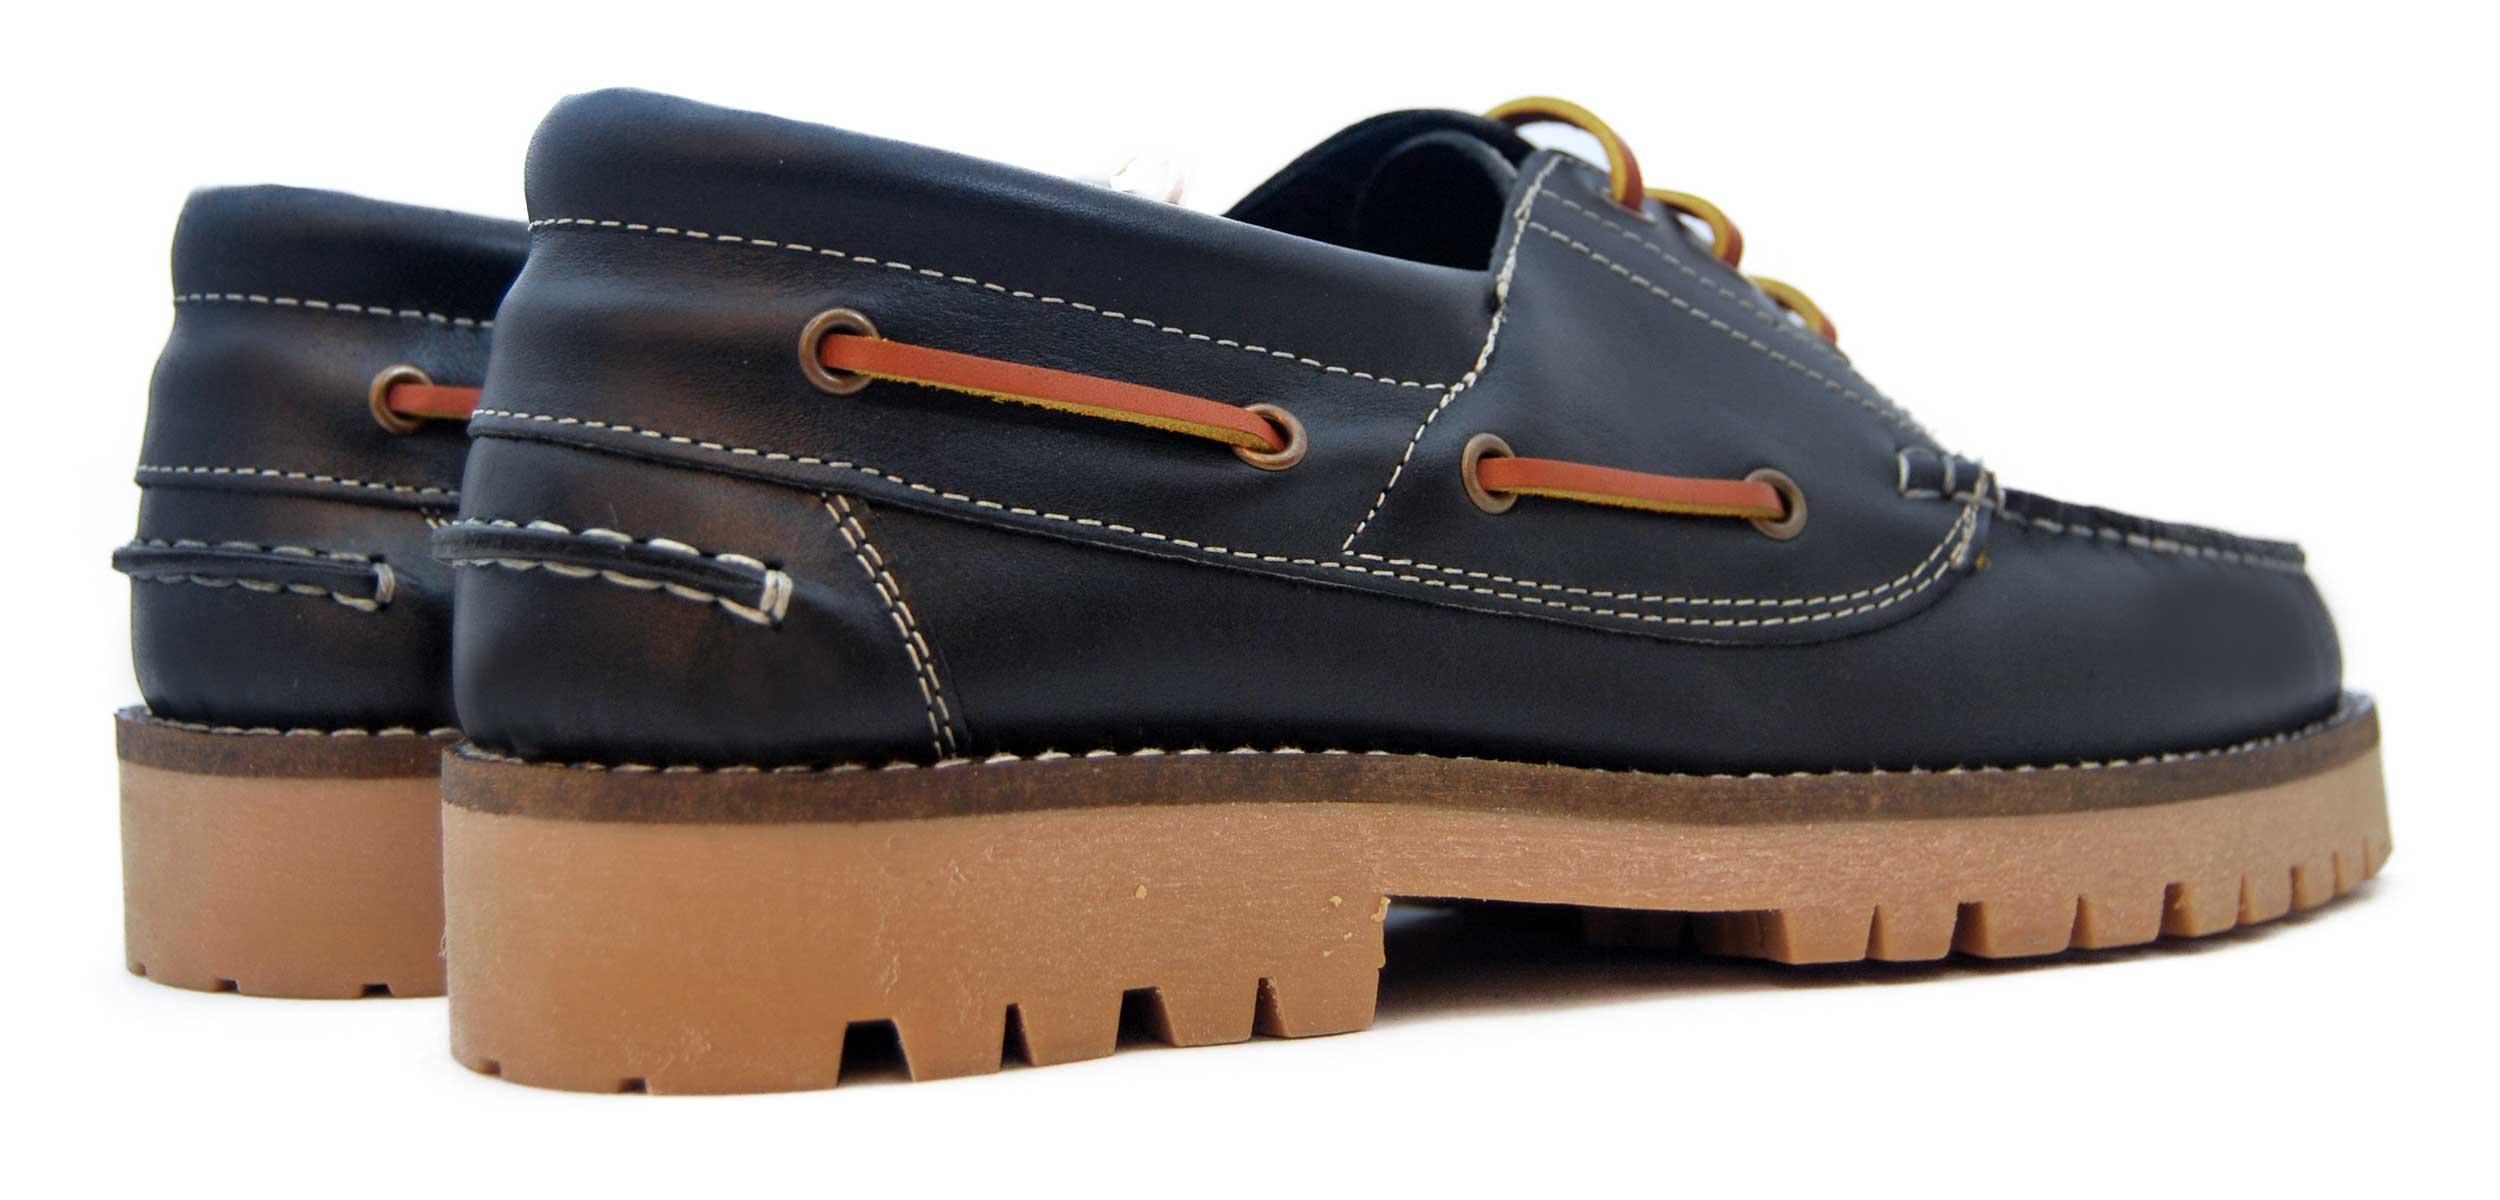 Foto 4 de Zapato Nautico Leñador Negro